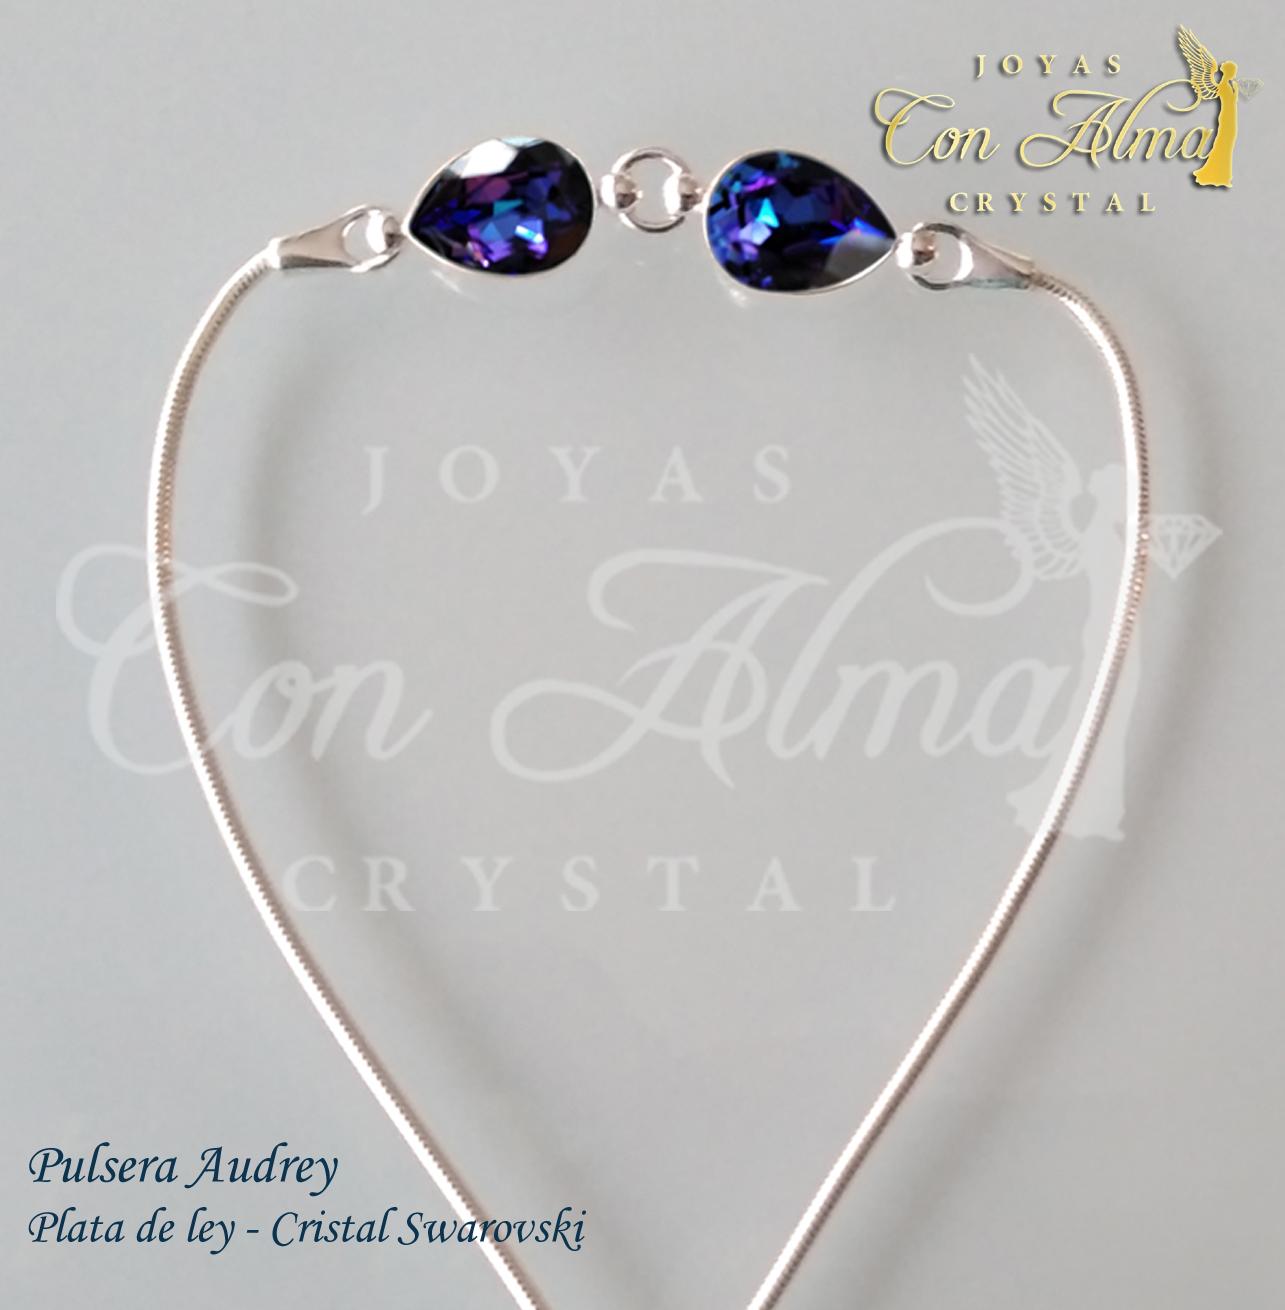 Pulsera Audrey - Alma Crystal 30 €